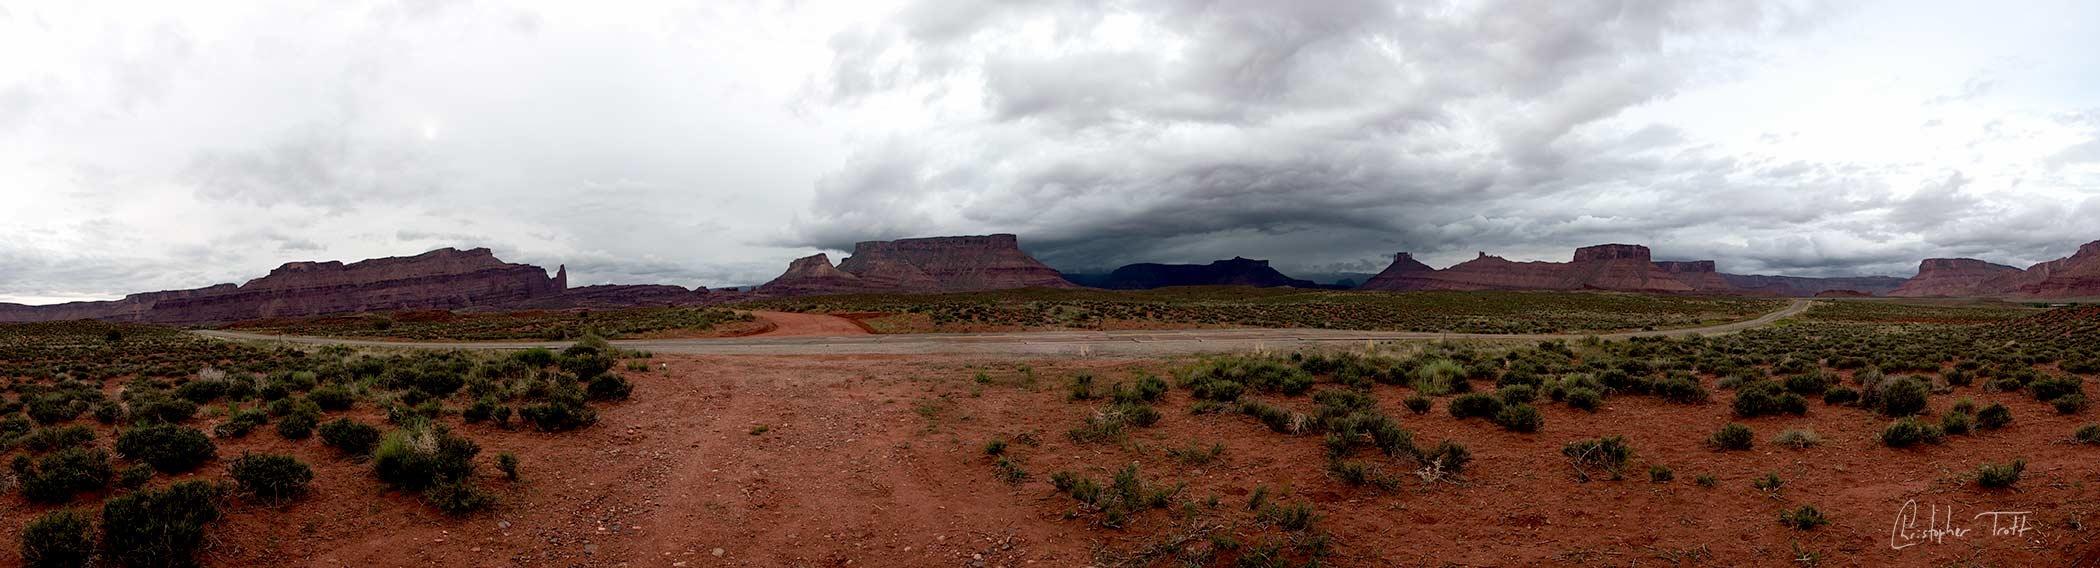 Utah Scenic Byway 128